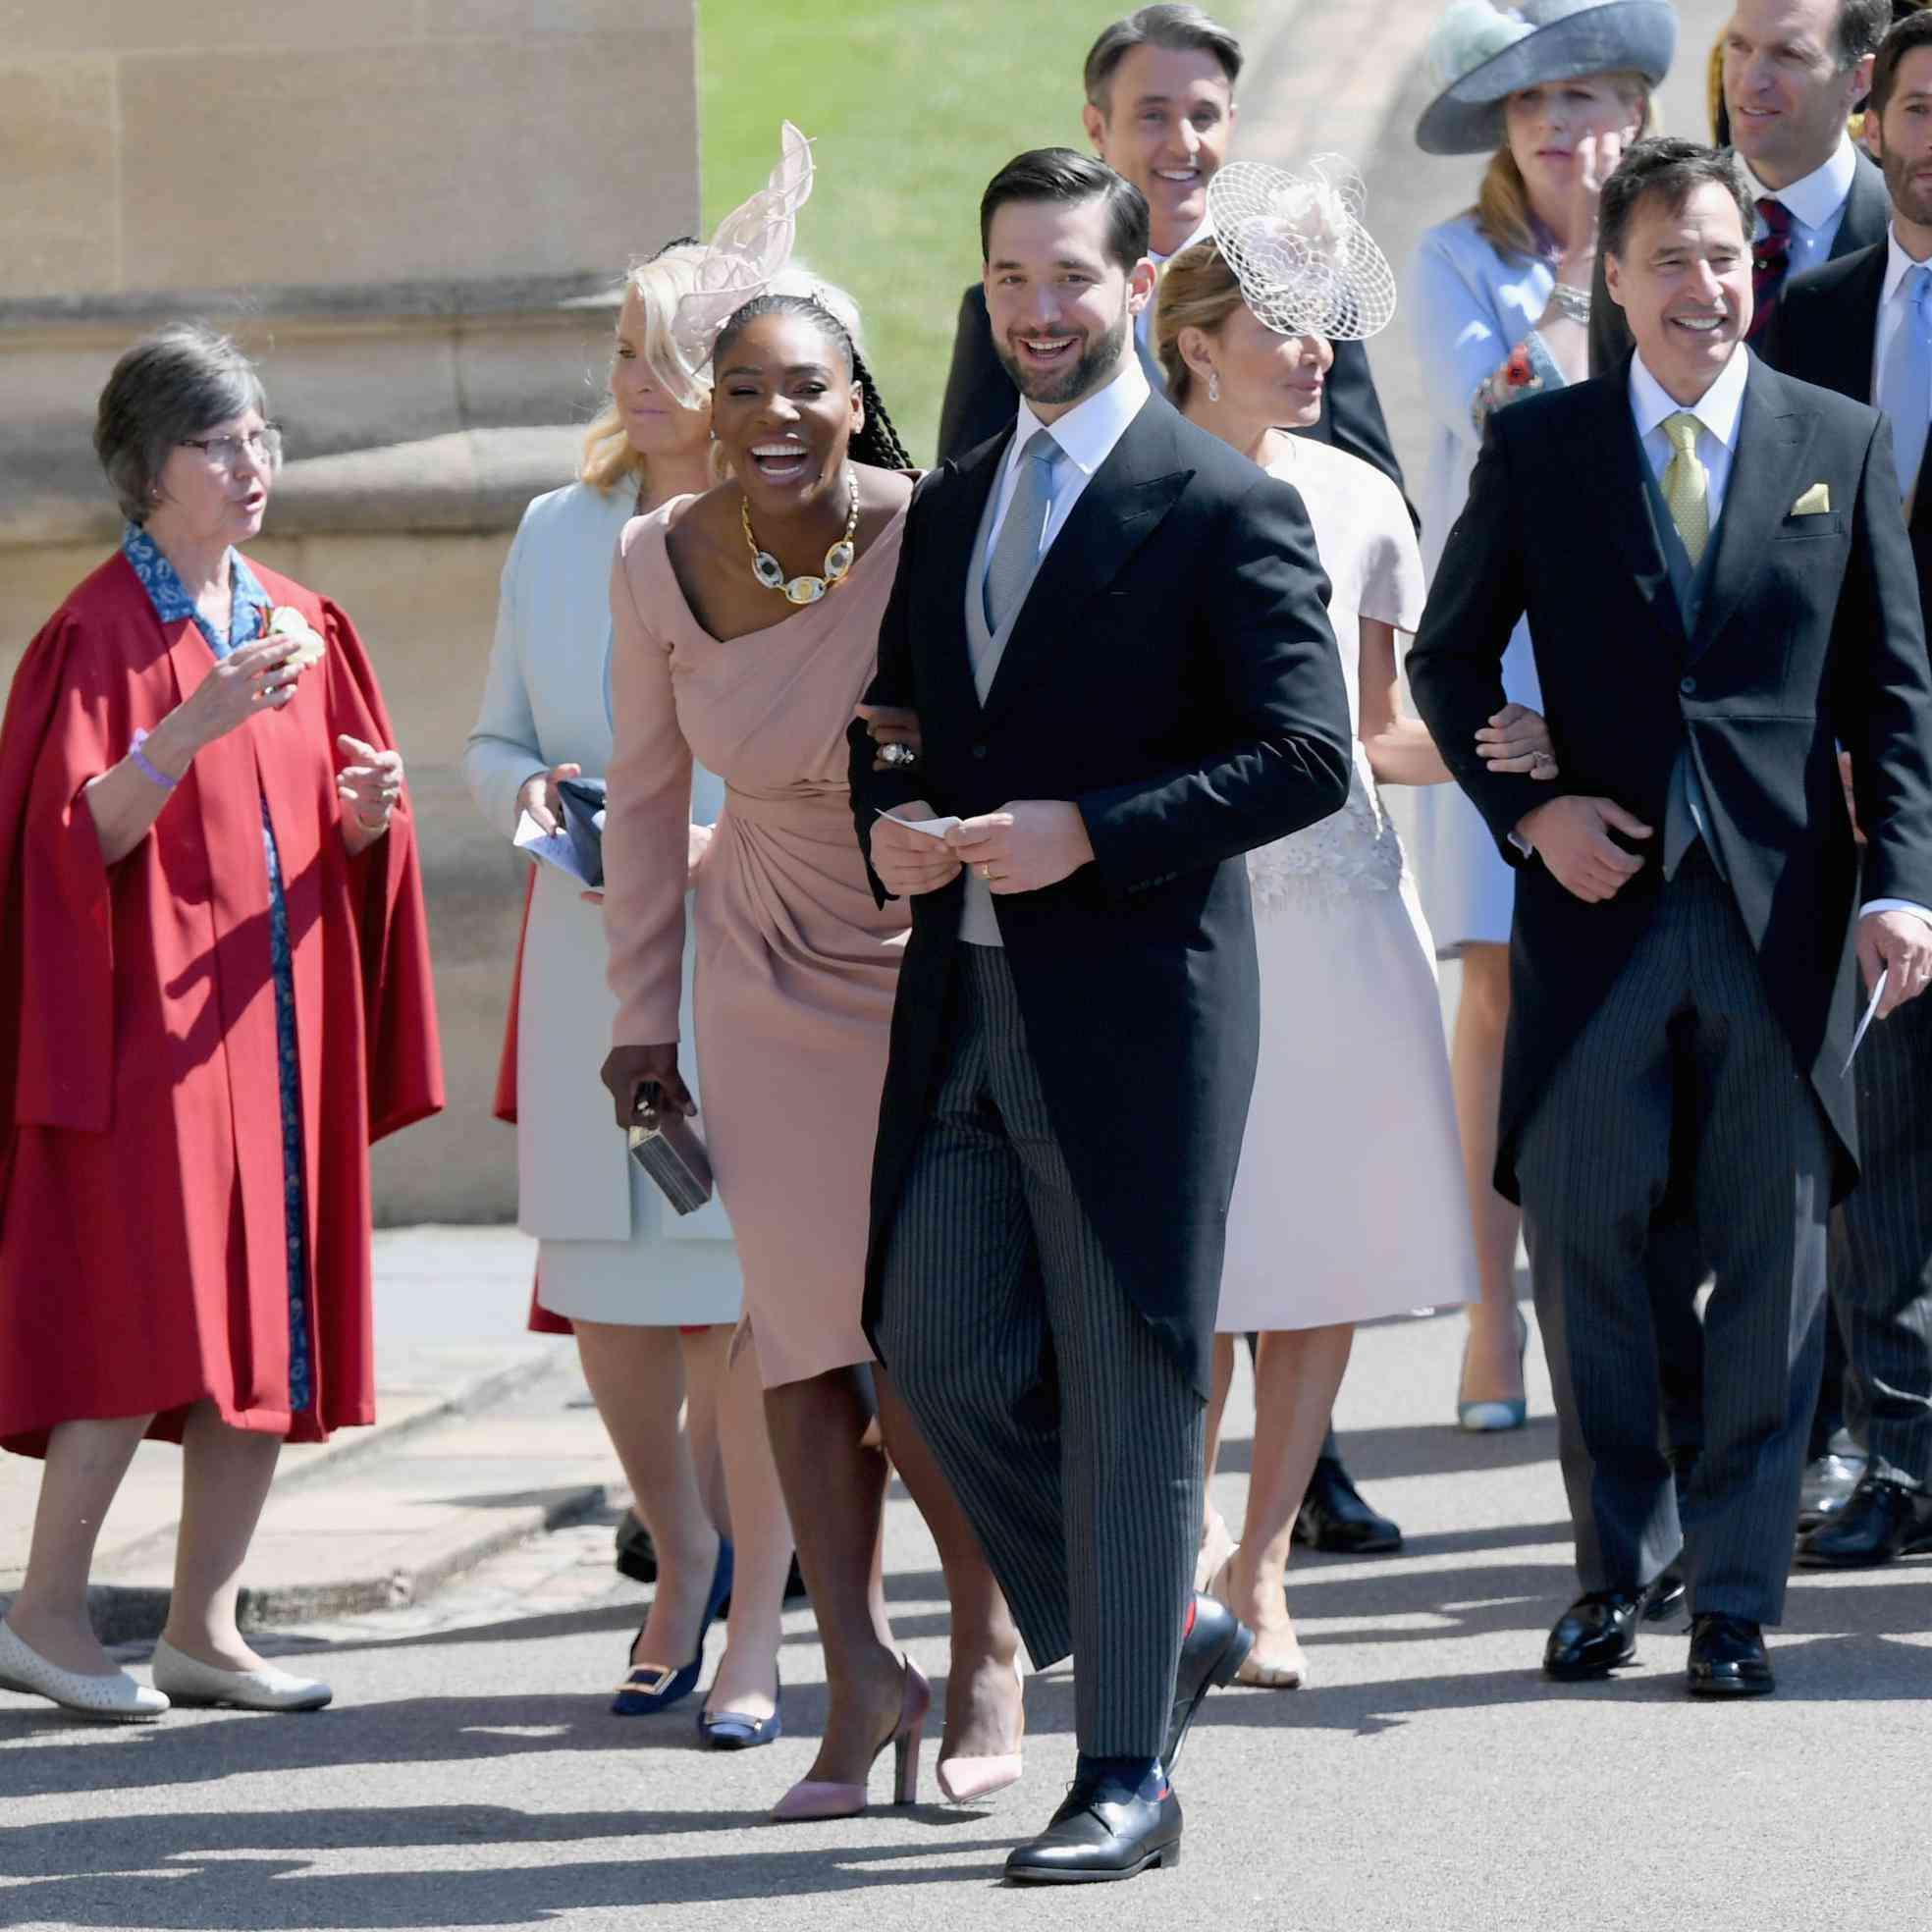 Serena Williams Royal Wedding.Royal Wedding Live Serena Williams And Priyanka Chopra Go Glam For